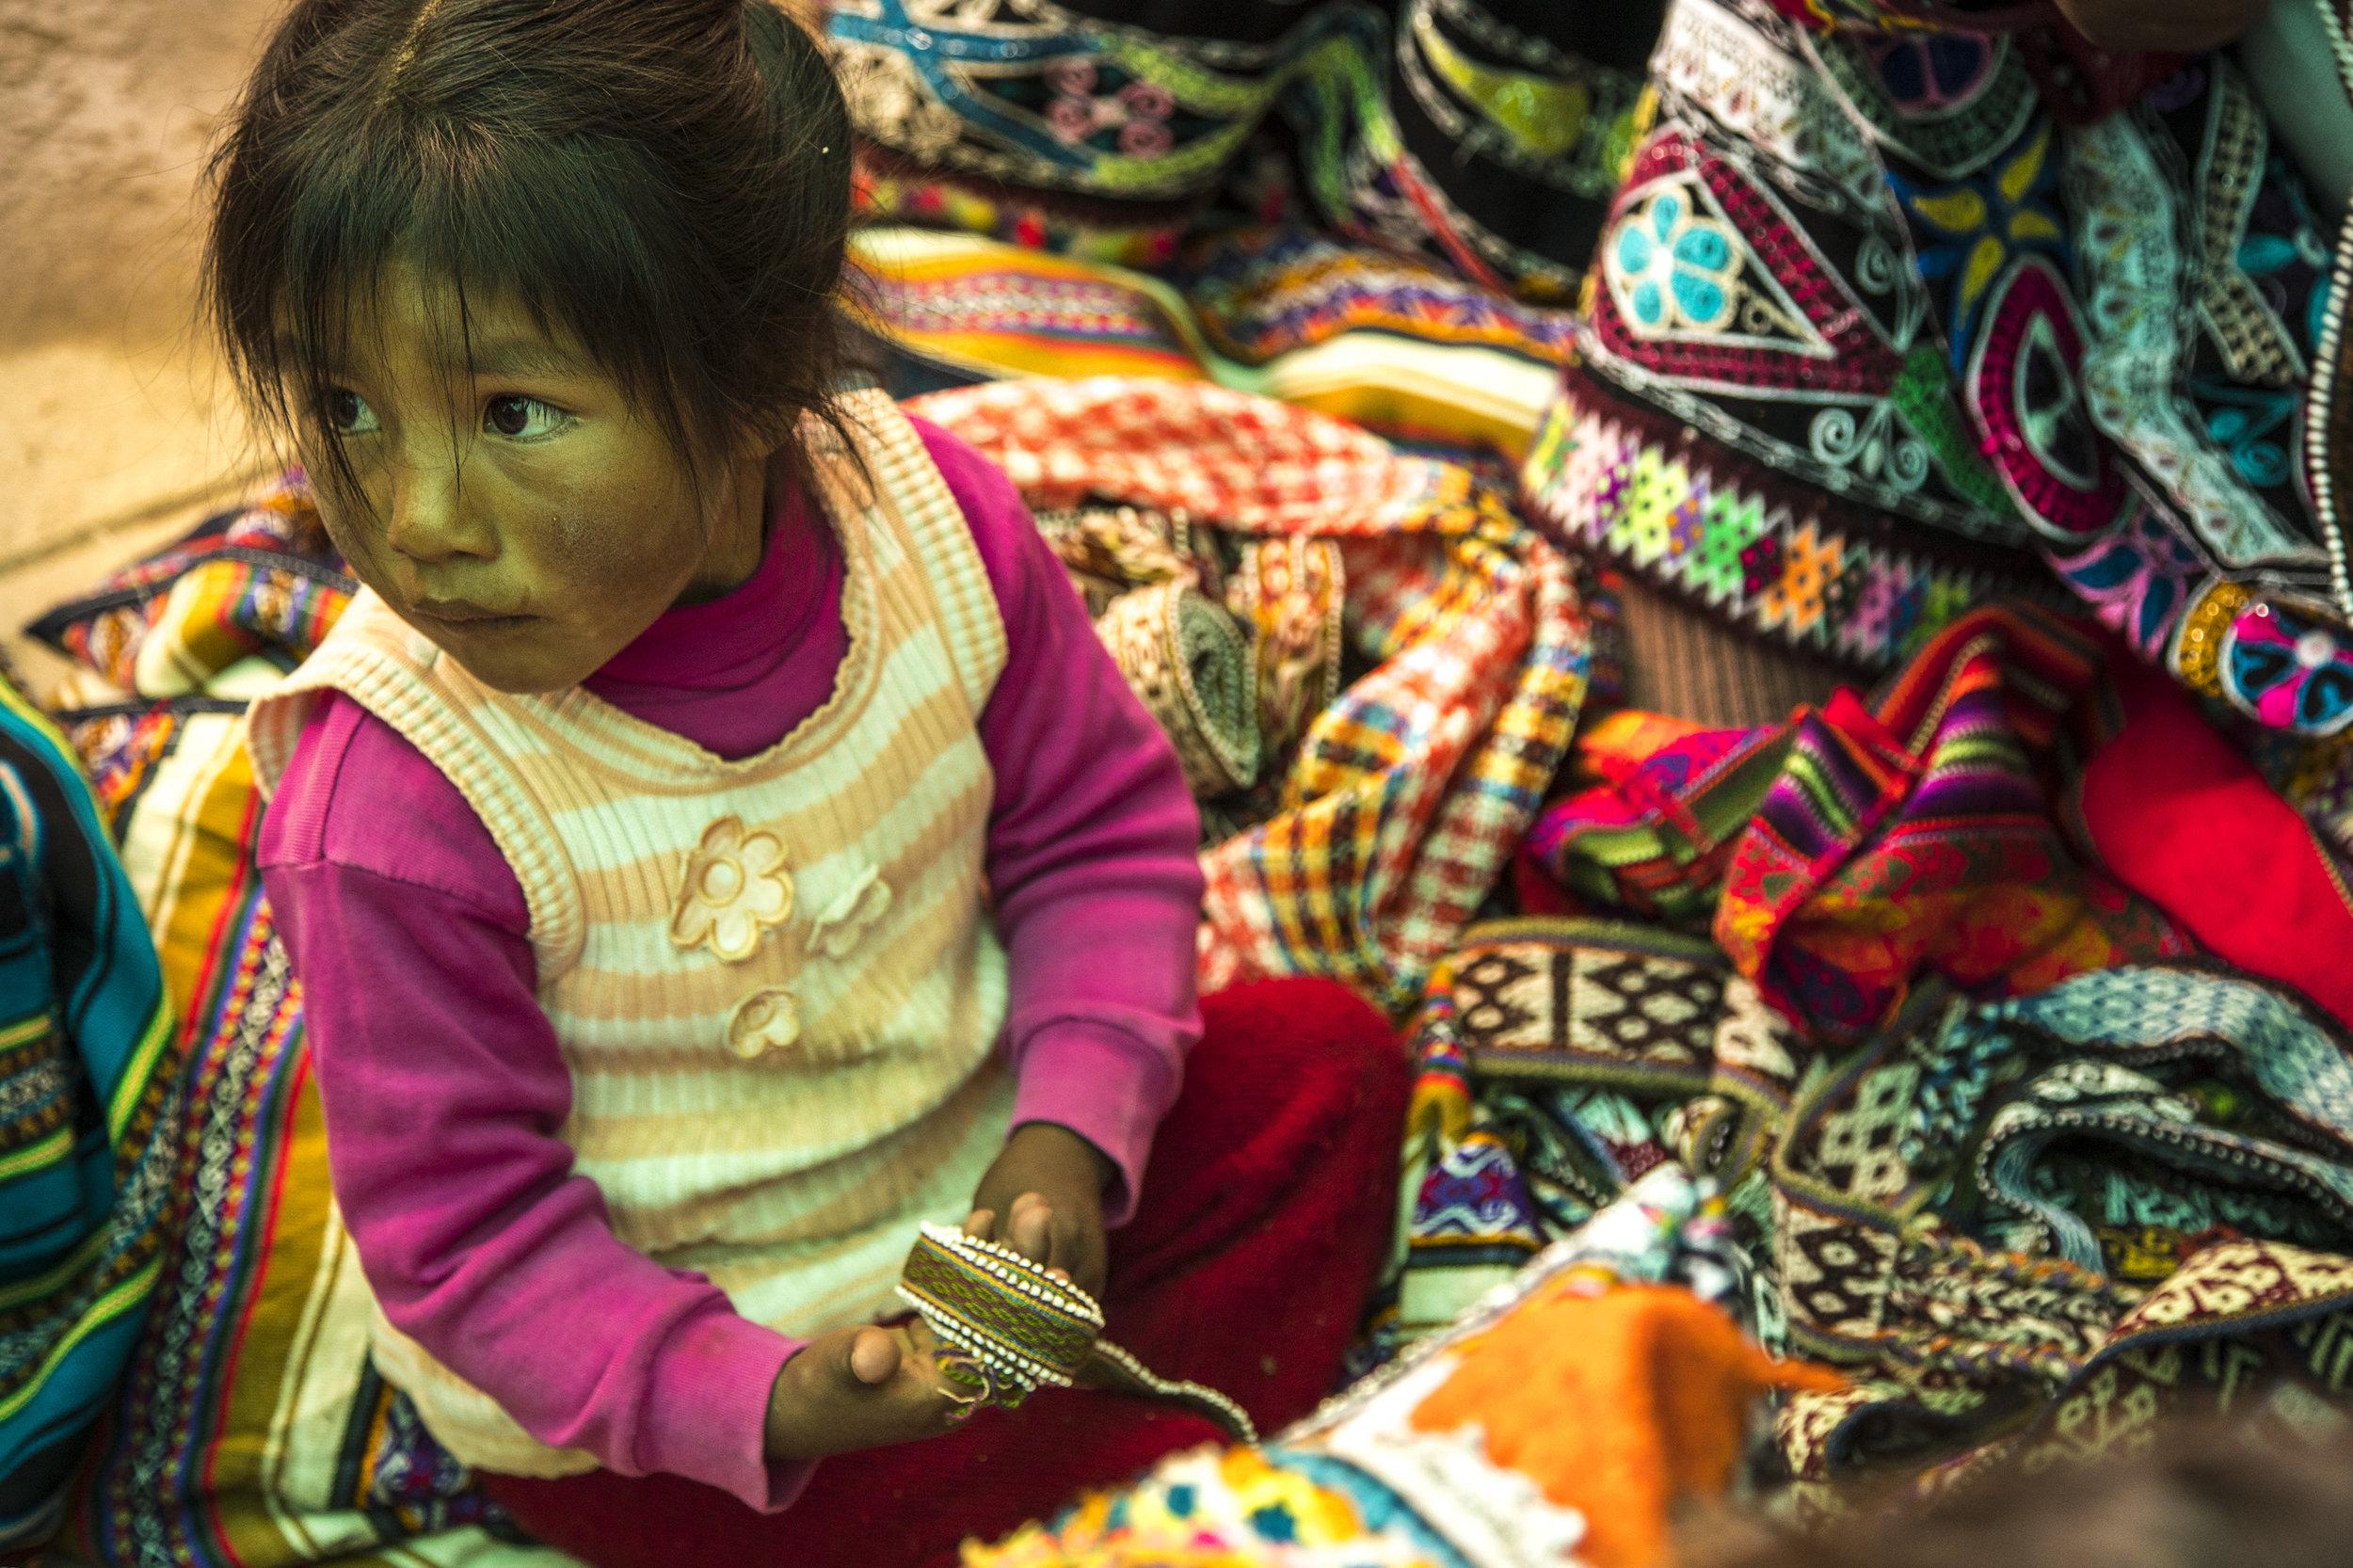 Simon+Needham+Humanitarian+Photography+Peru+22.jpg